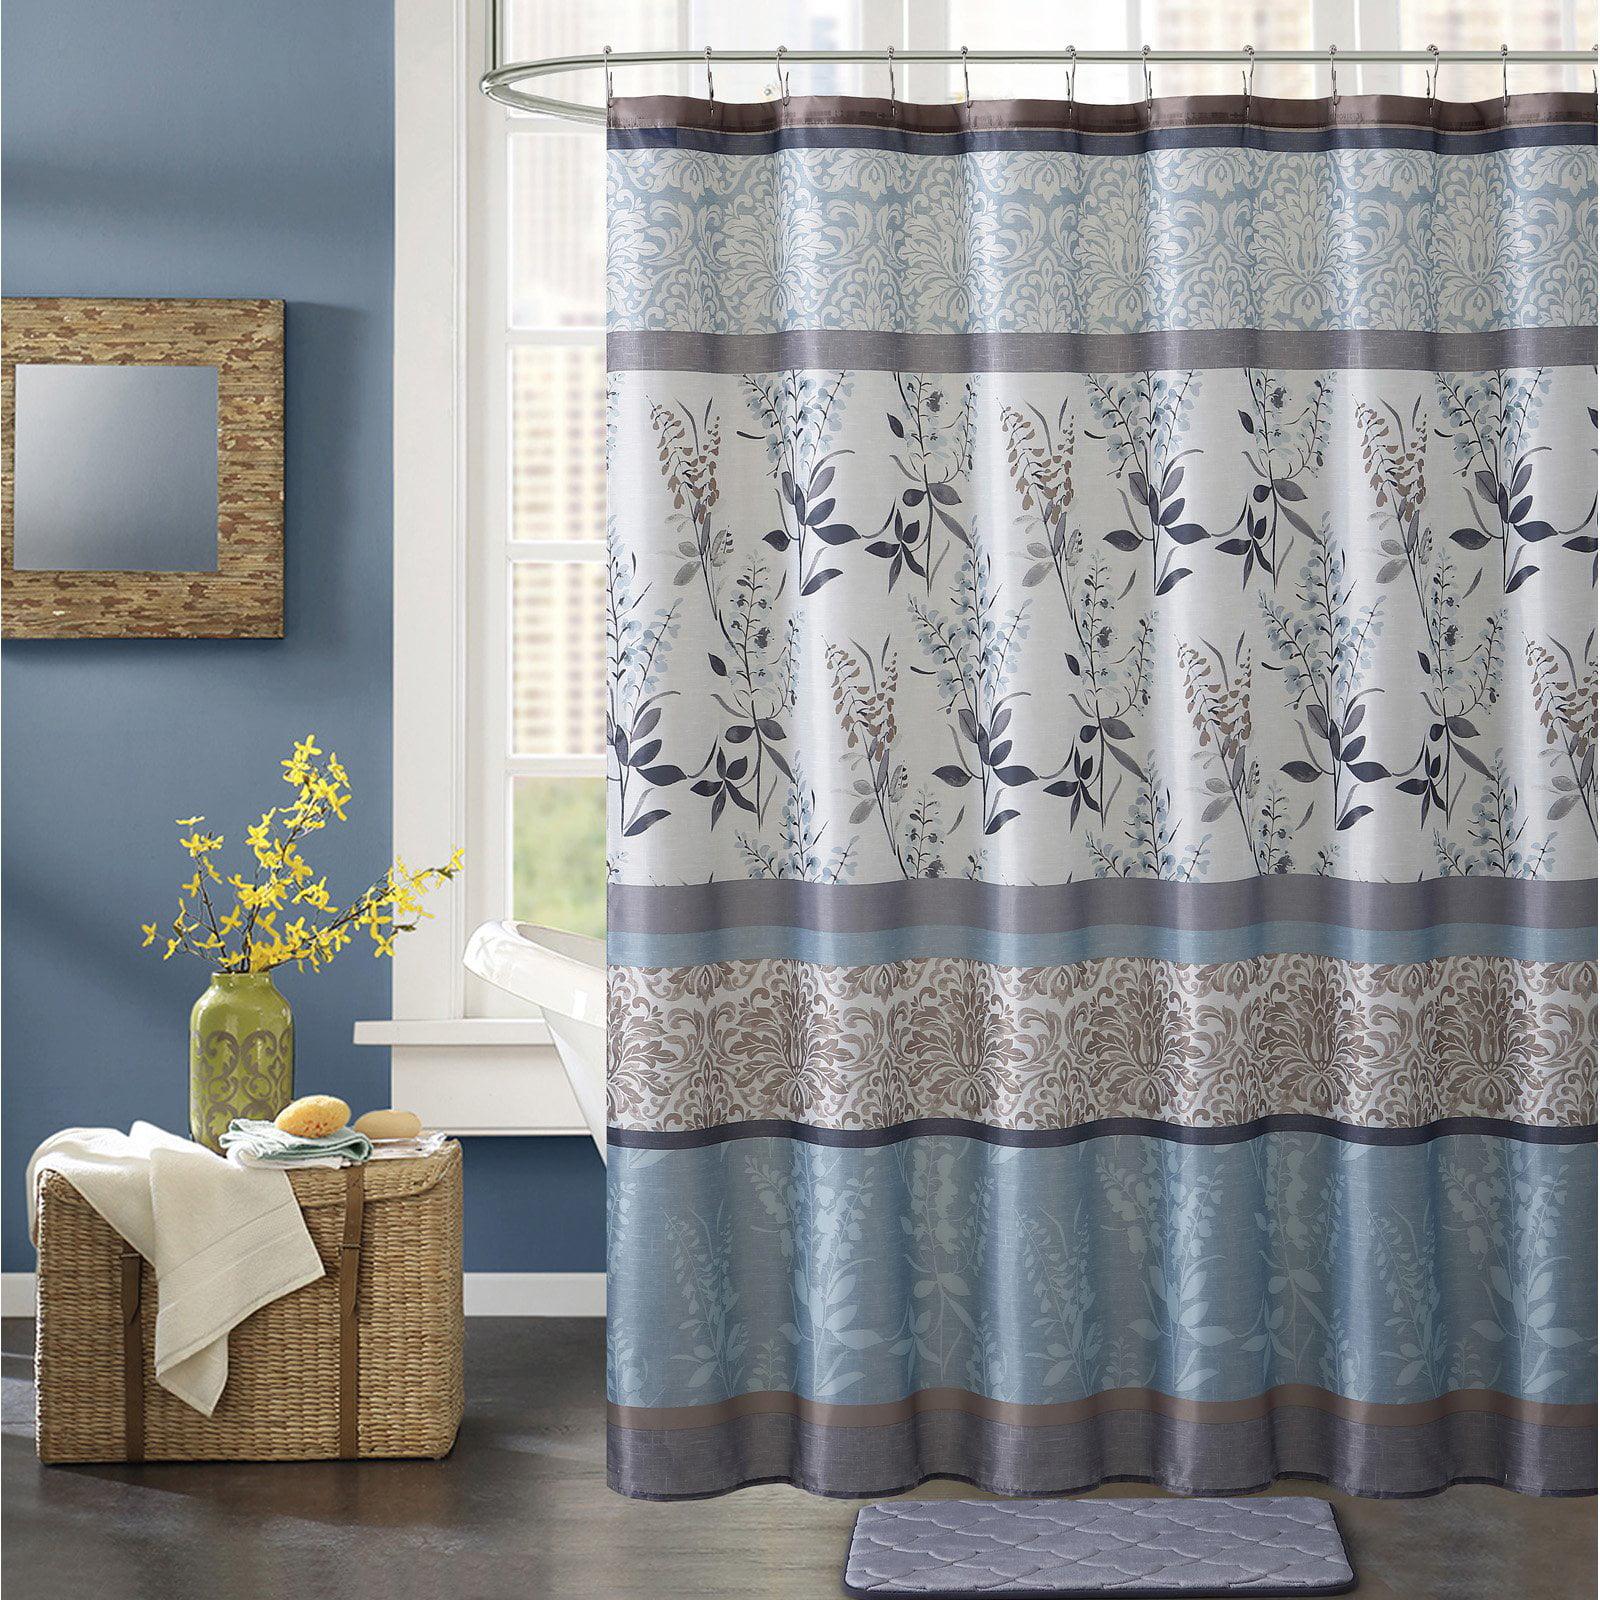 VCNY Home 14 Pc Complete Hawthorne Geometric Fabric Shower Curtain /& Hooks Set